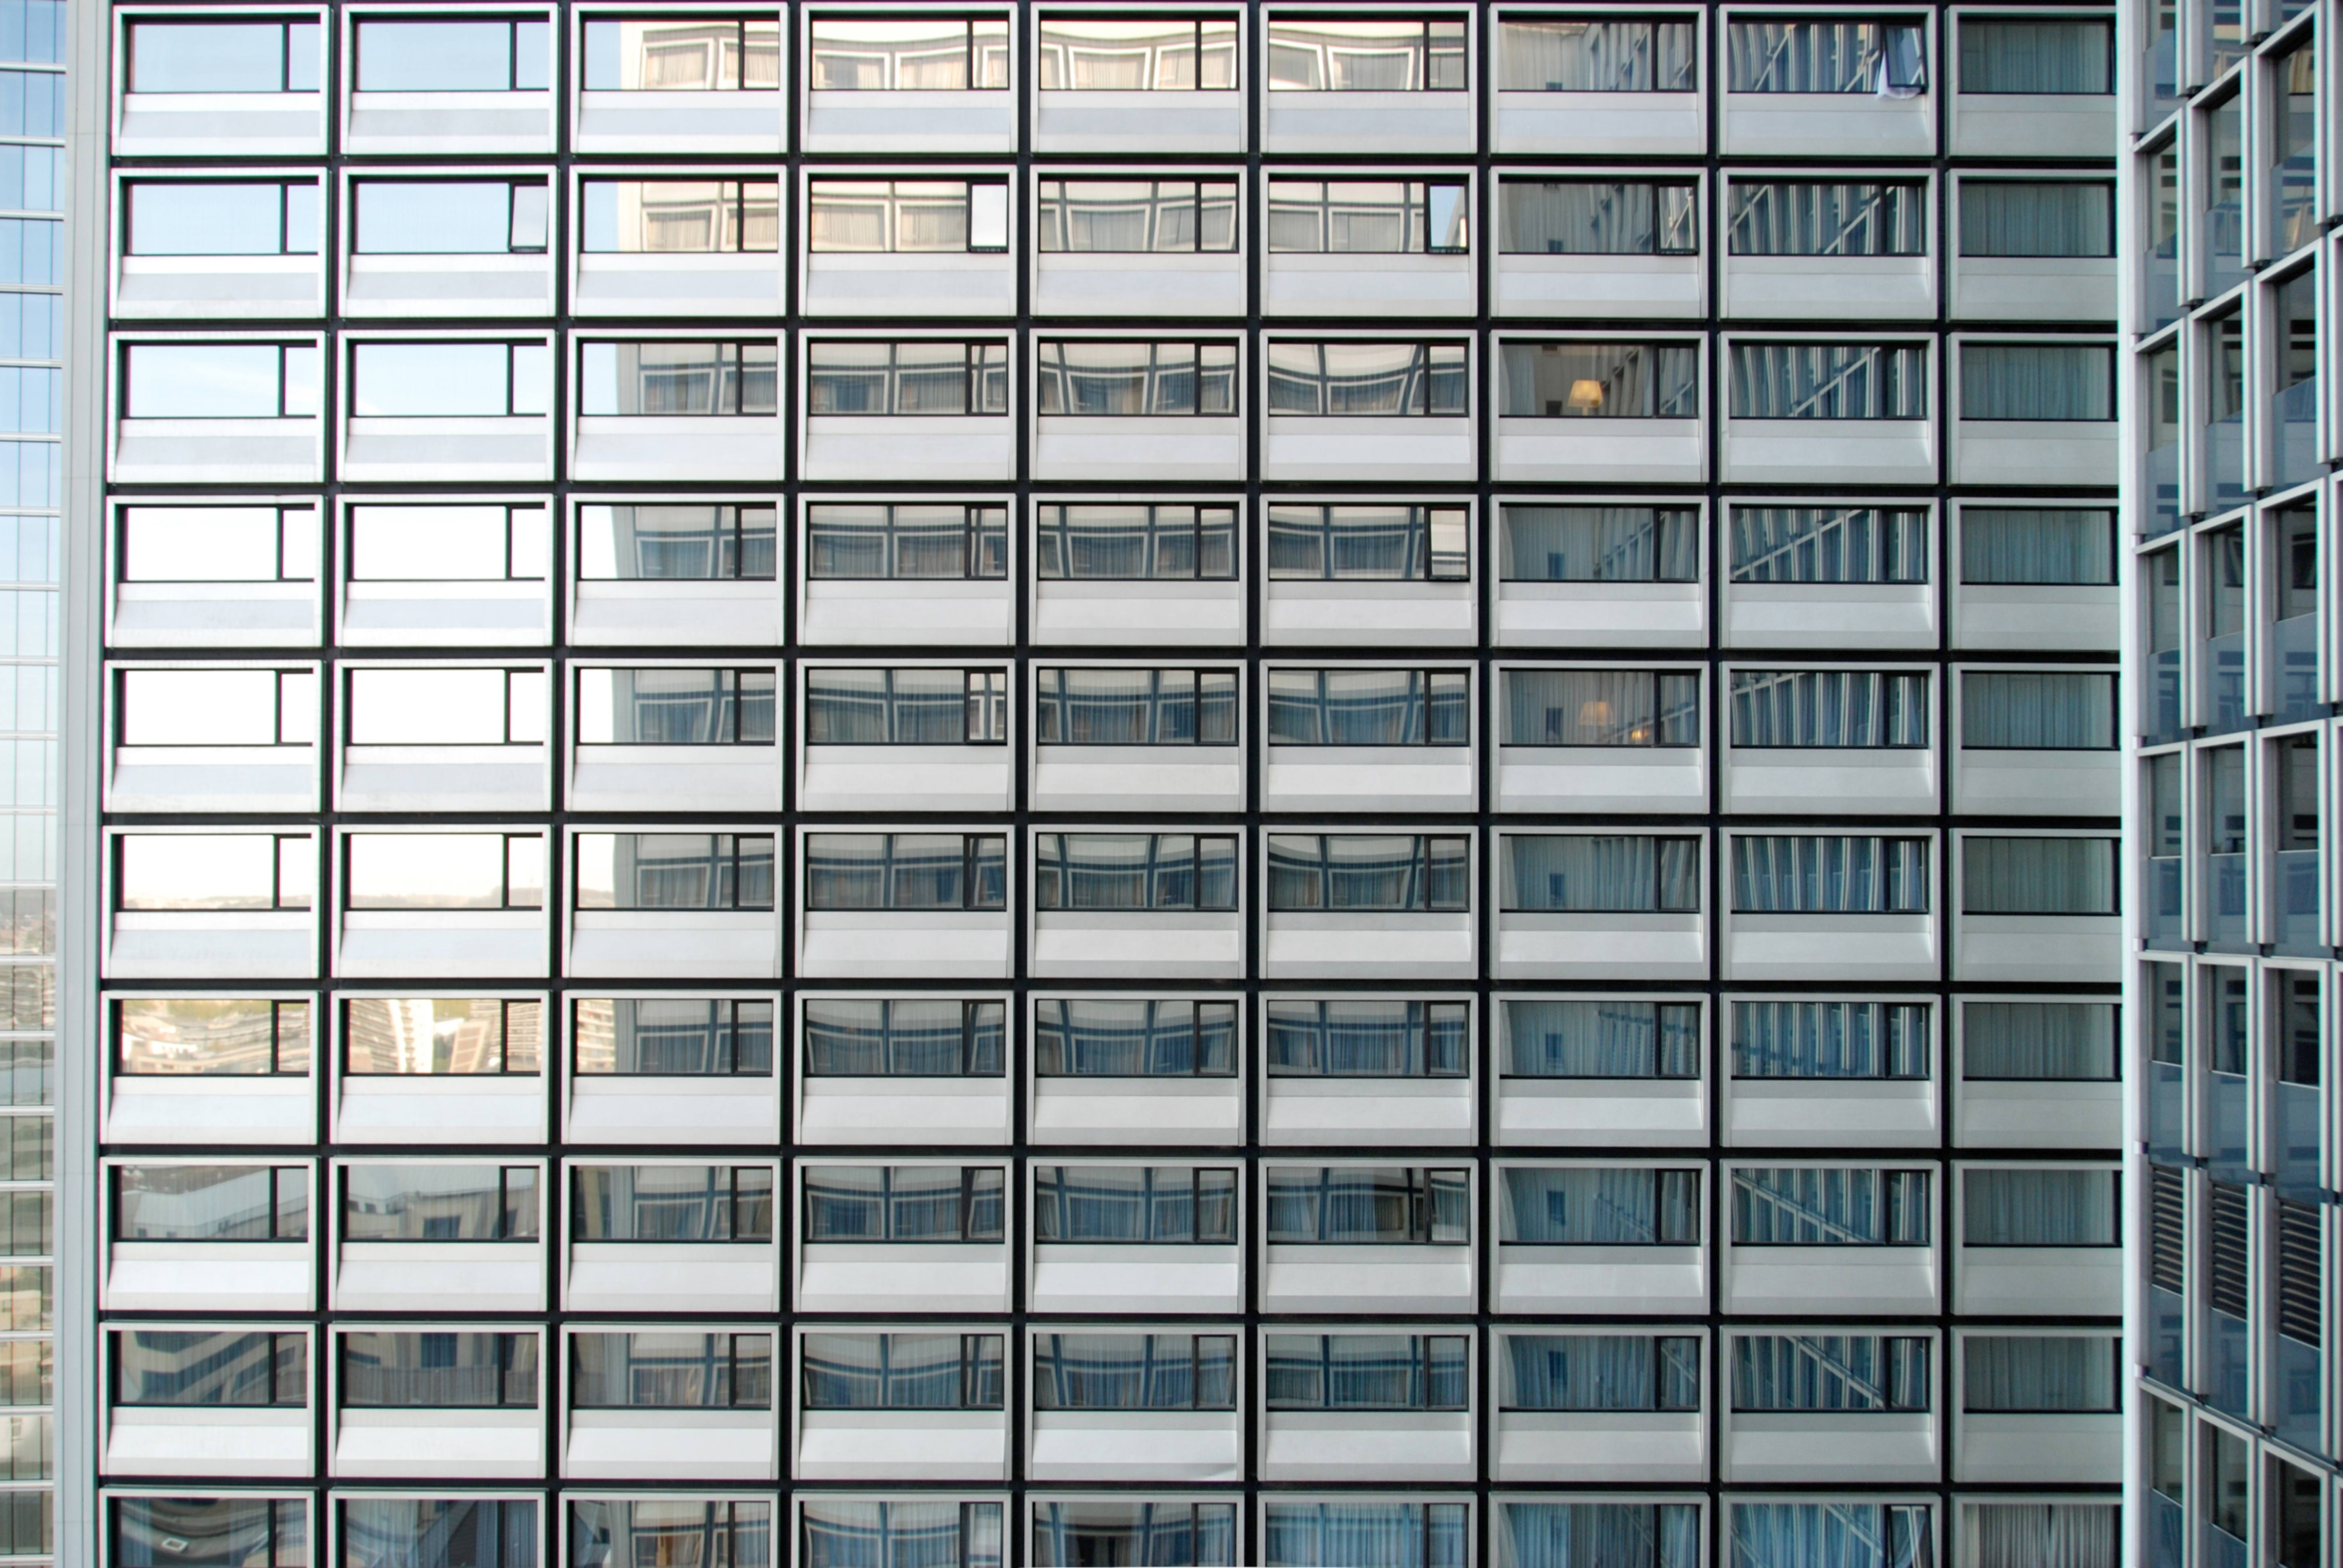 Hotel Windows at Daylight